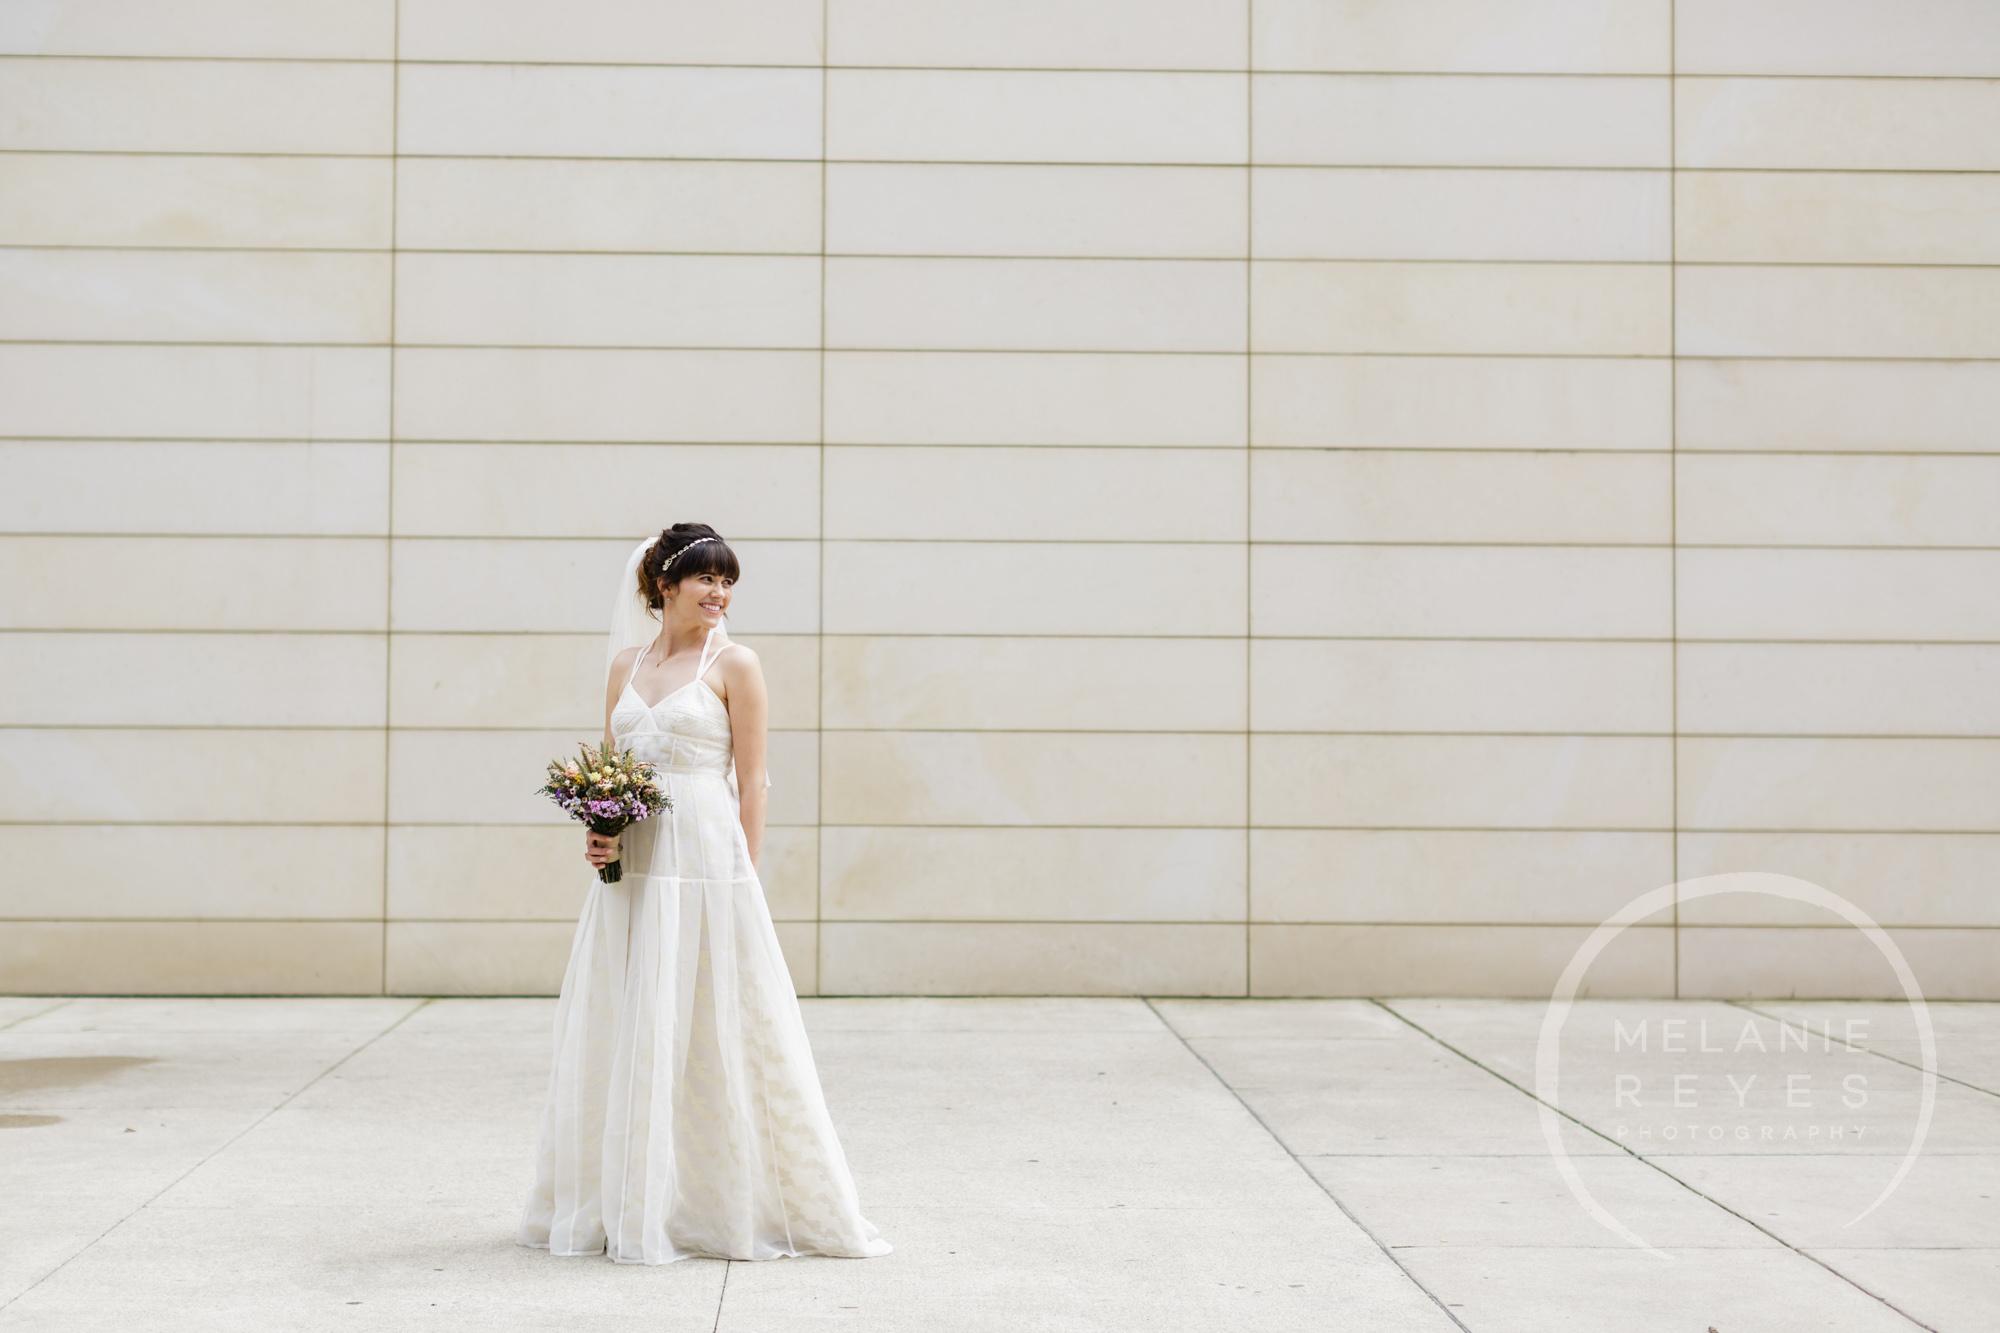 carlylewie_annarbor_wedding_-36.jpg